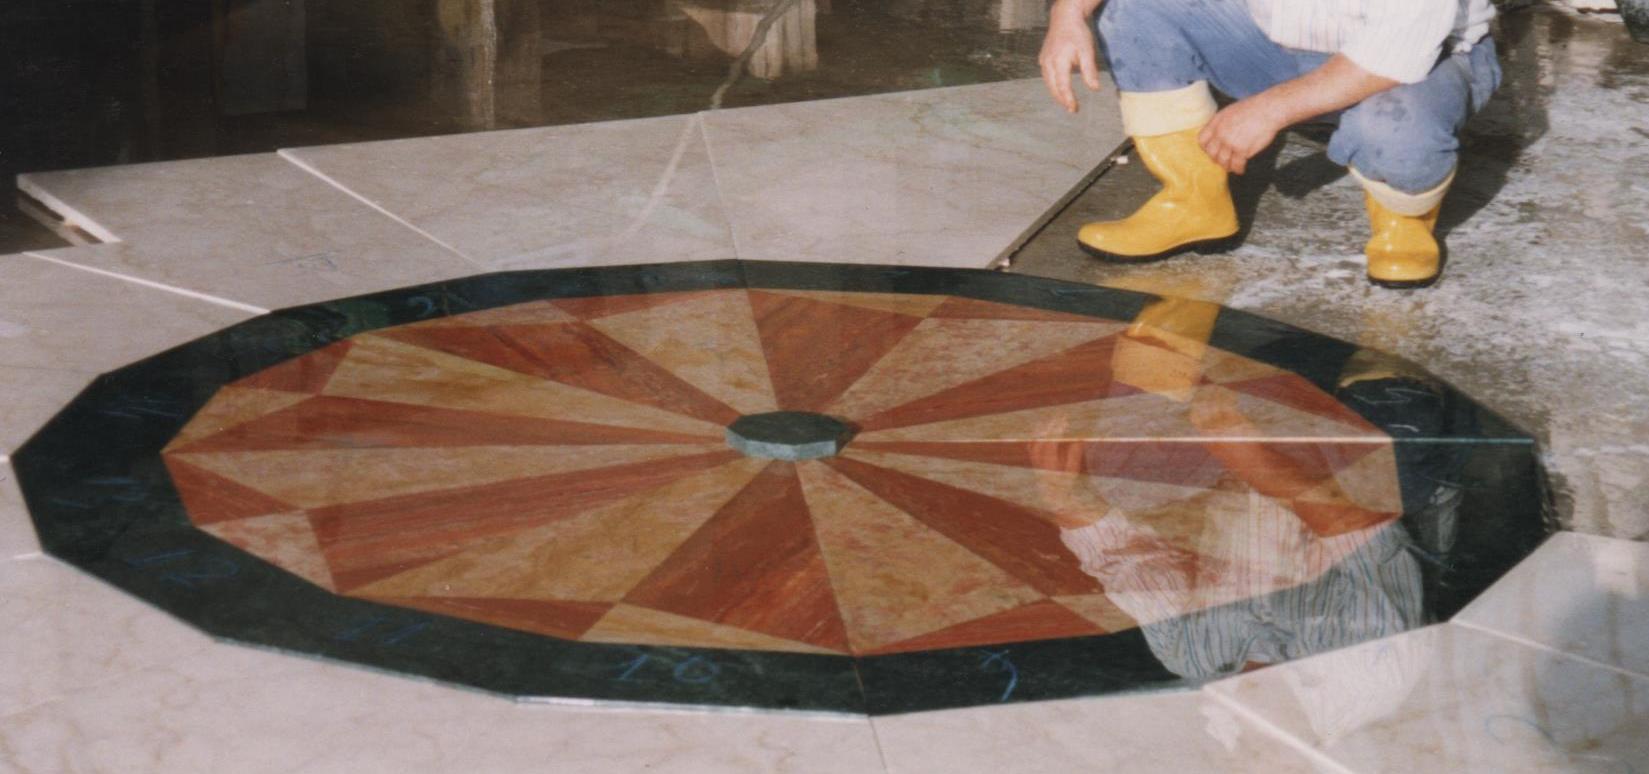 pavimento compos policroma.jpg